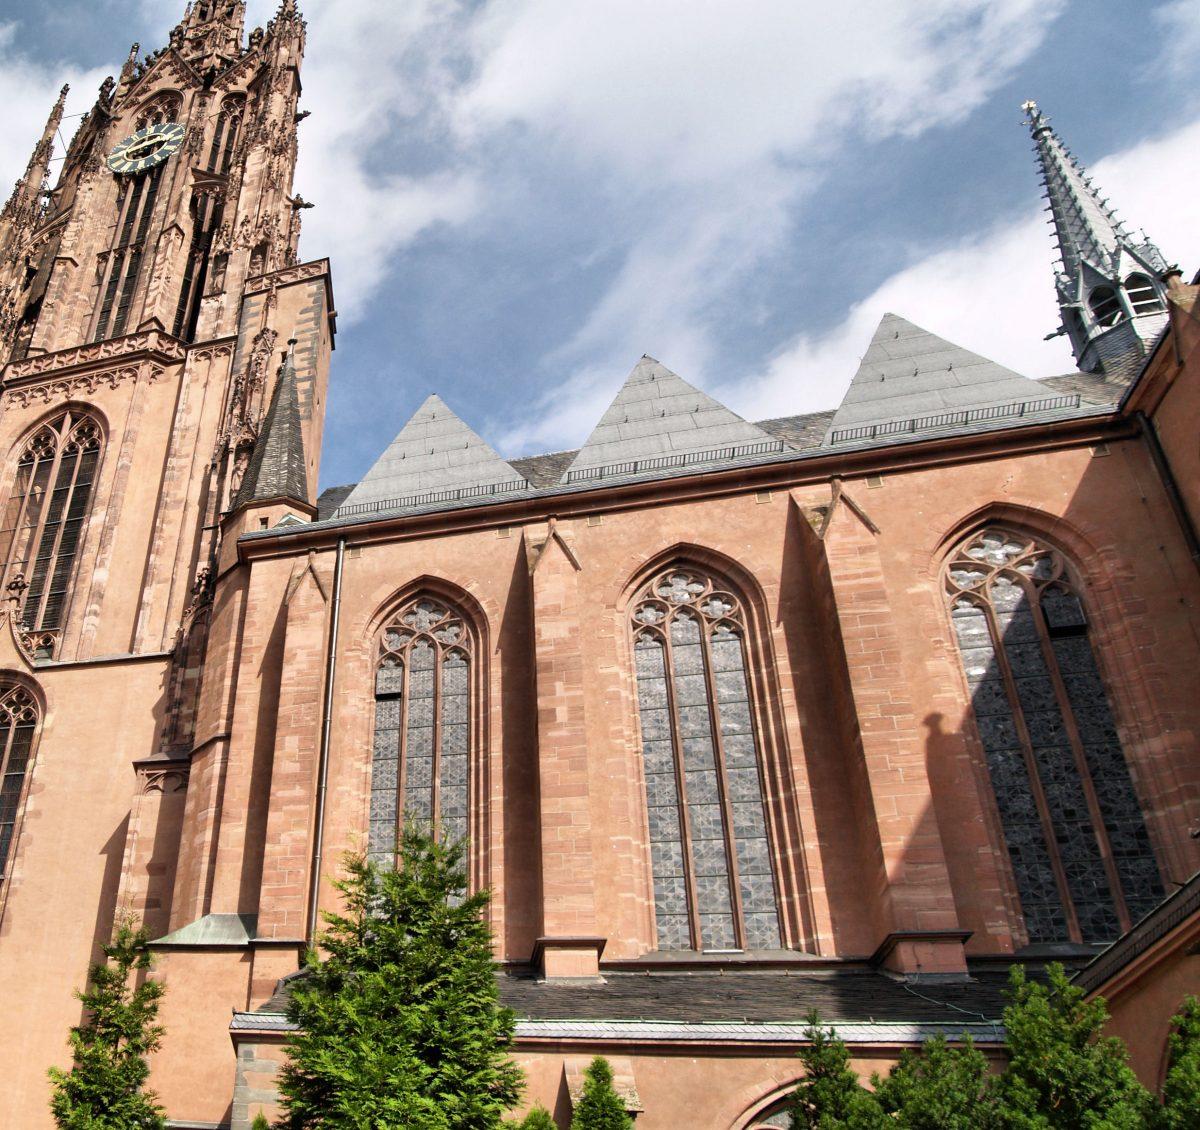 Frankfurt Cathedral in central Frankfurt